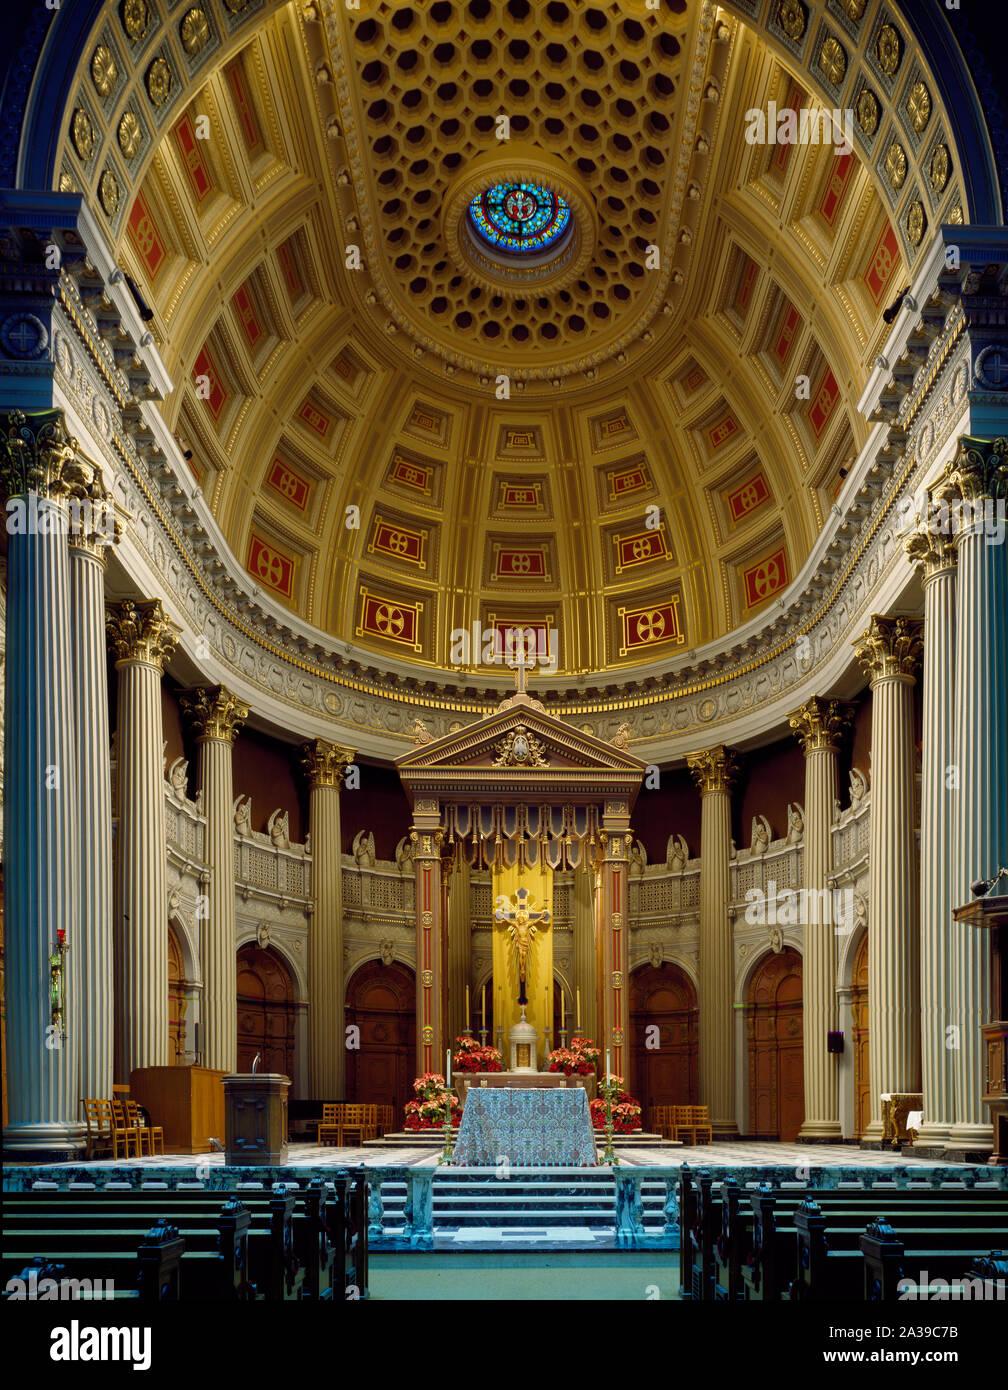 Sanctuary Of St Ignatius Church On The Campus Of The University Of San Francisco San Francisco California Stock Photo Alamy